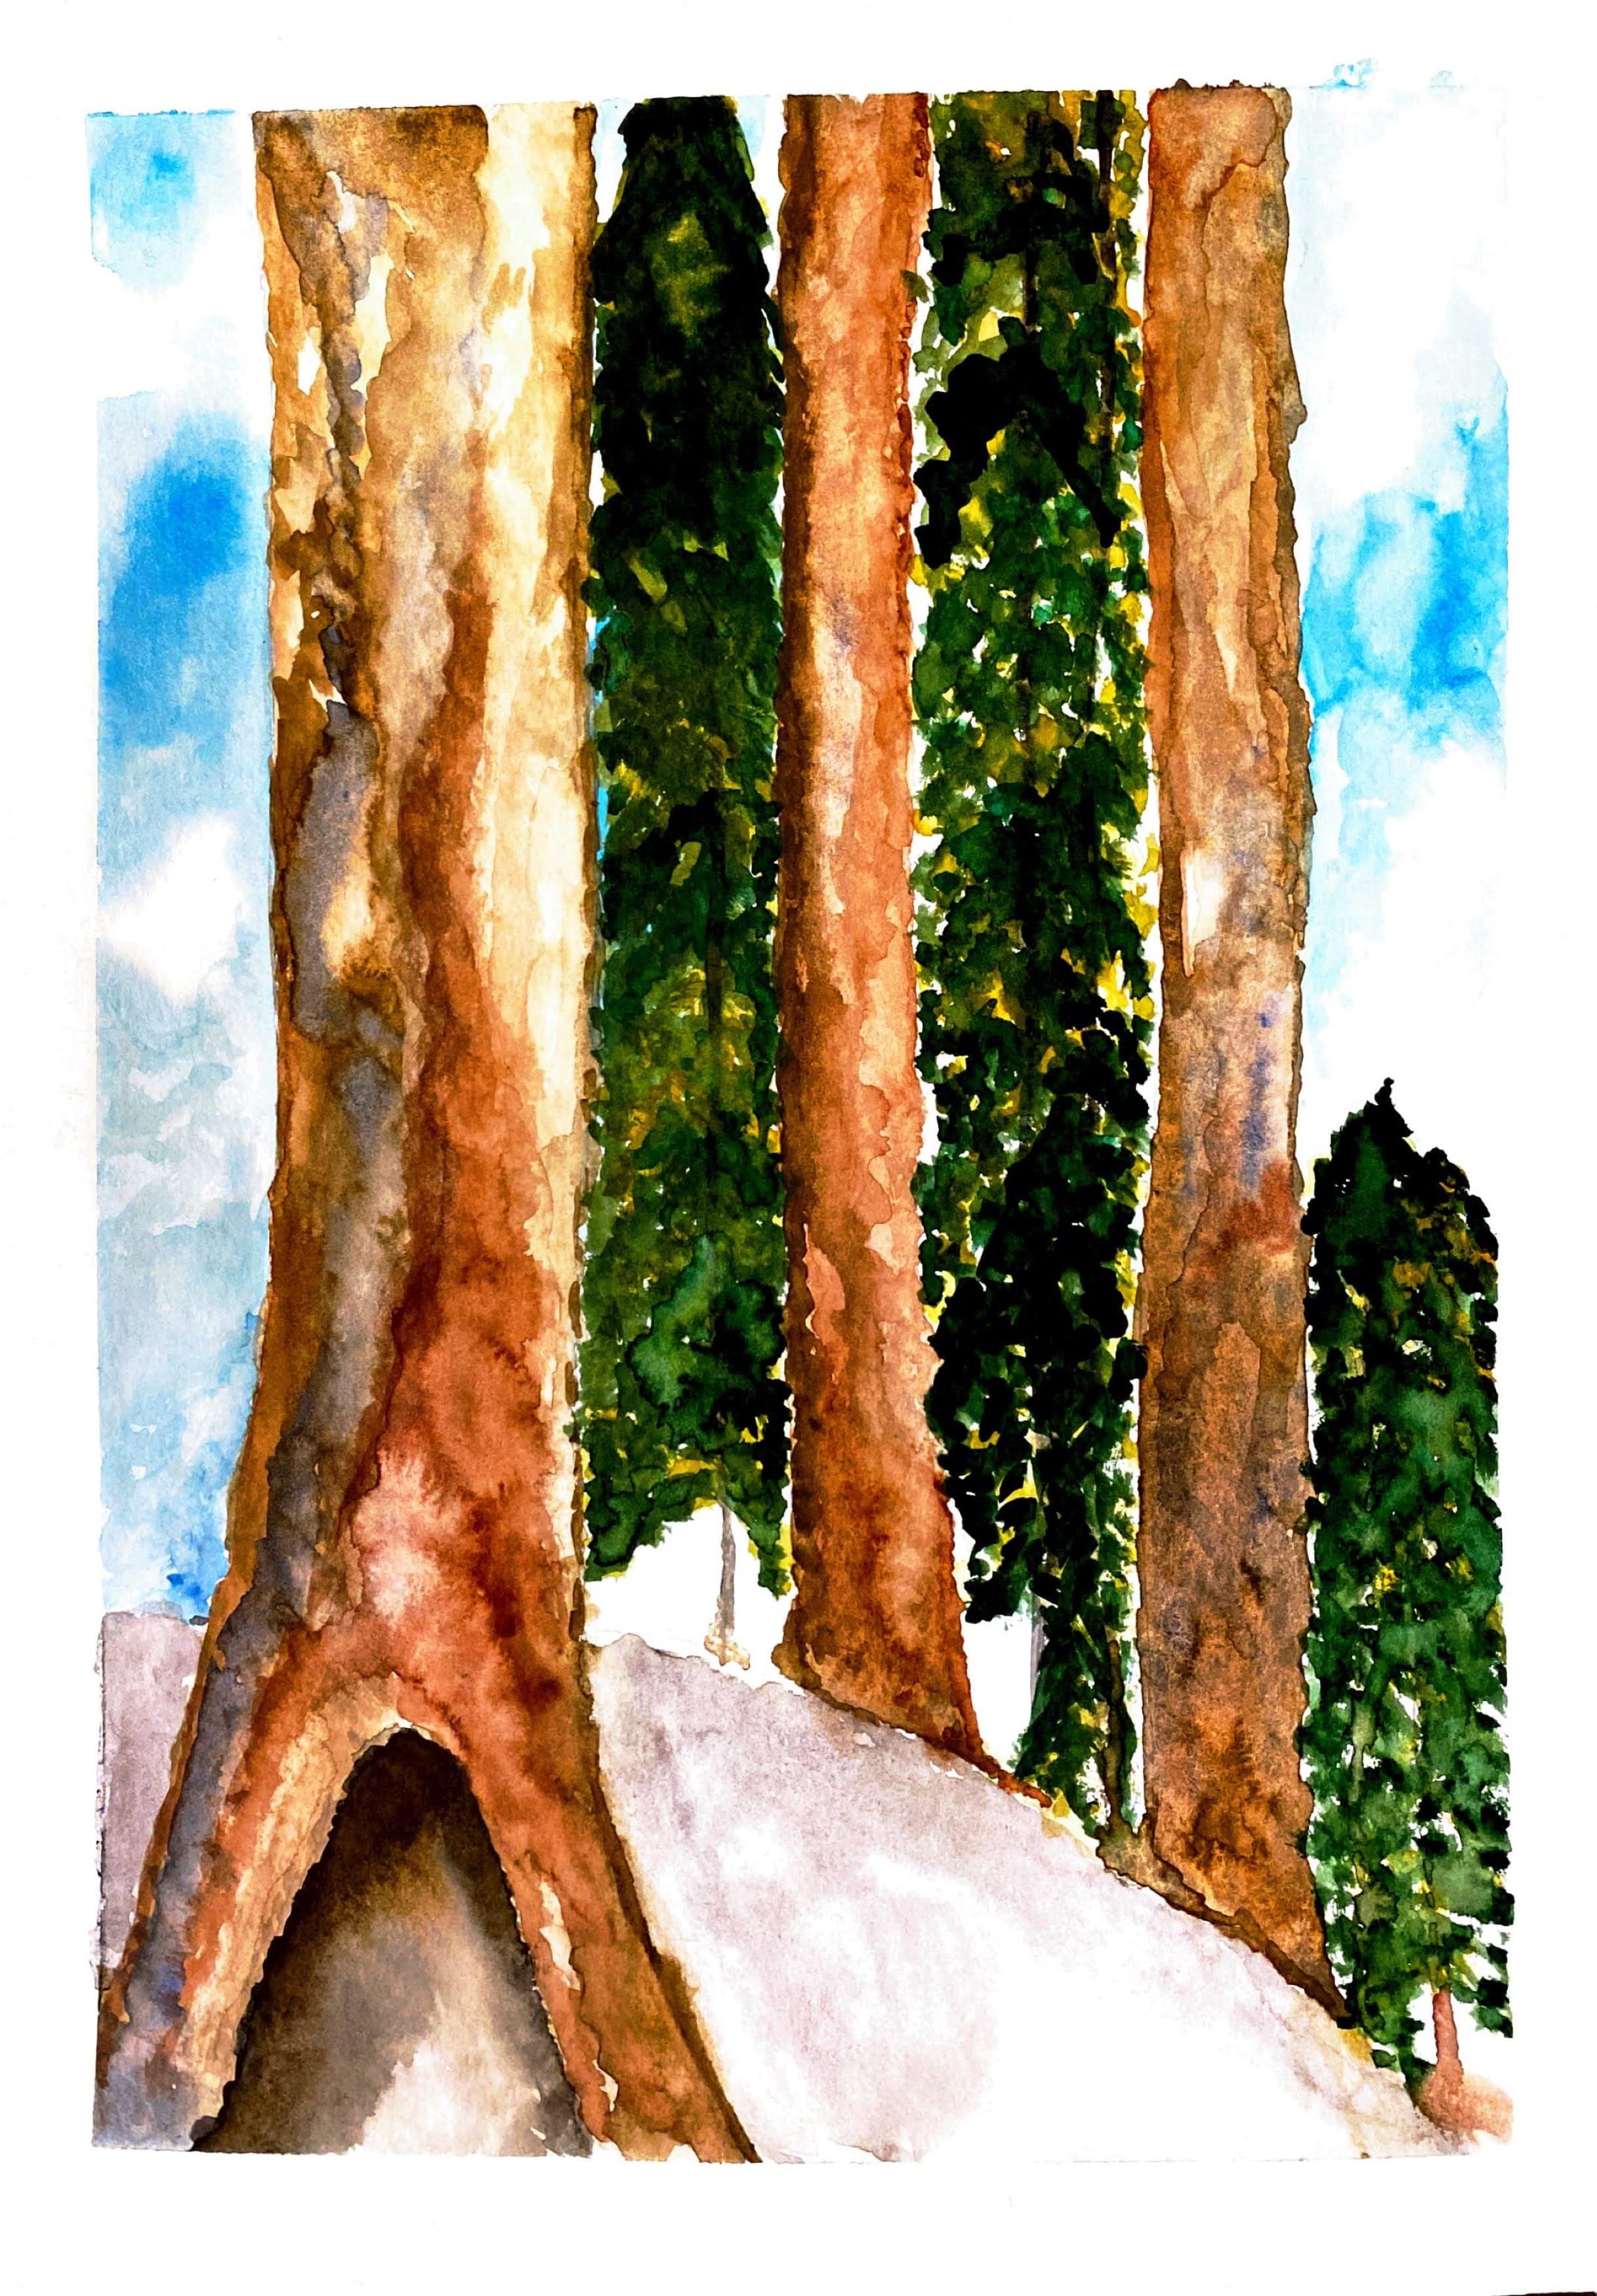 Aud's Redwoods